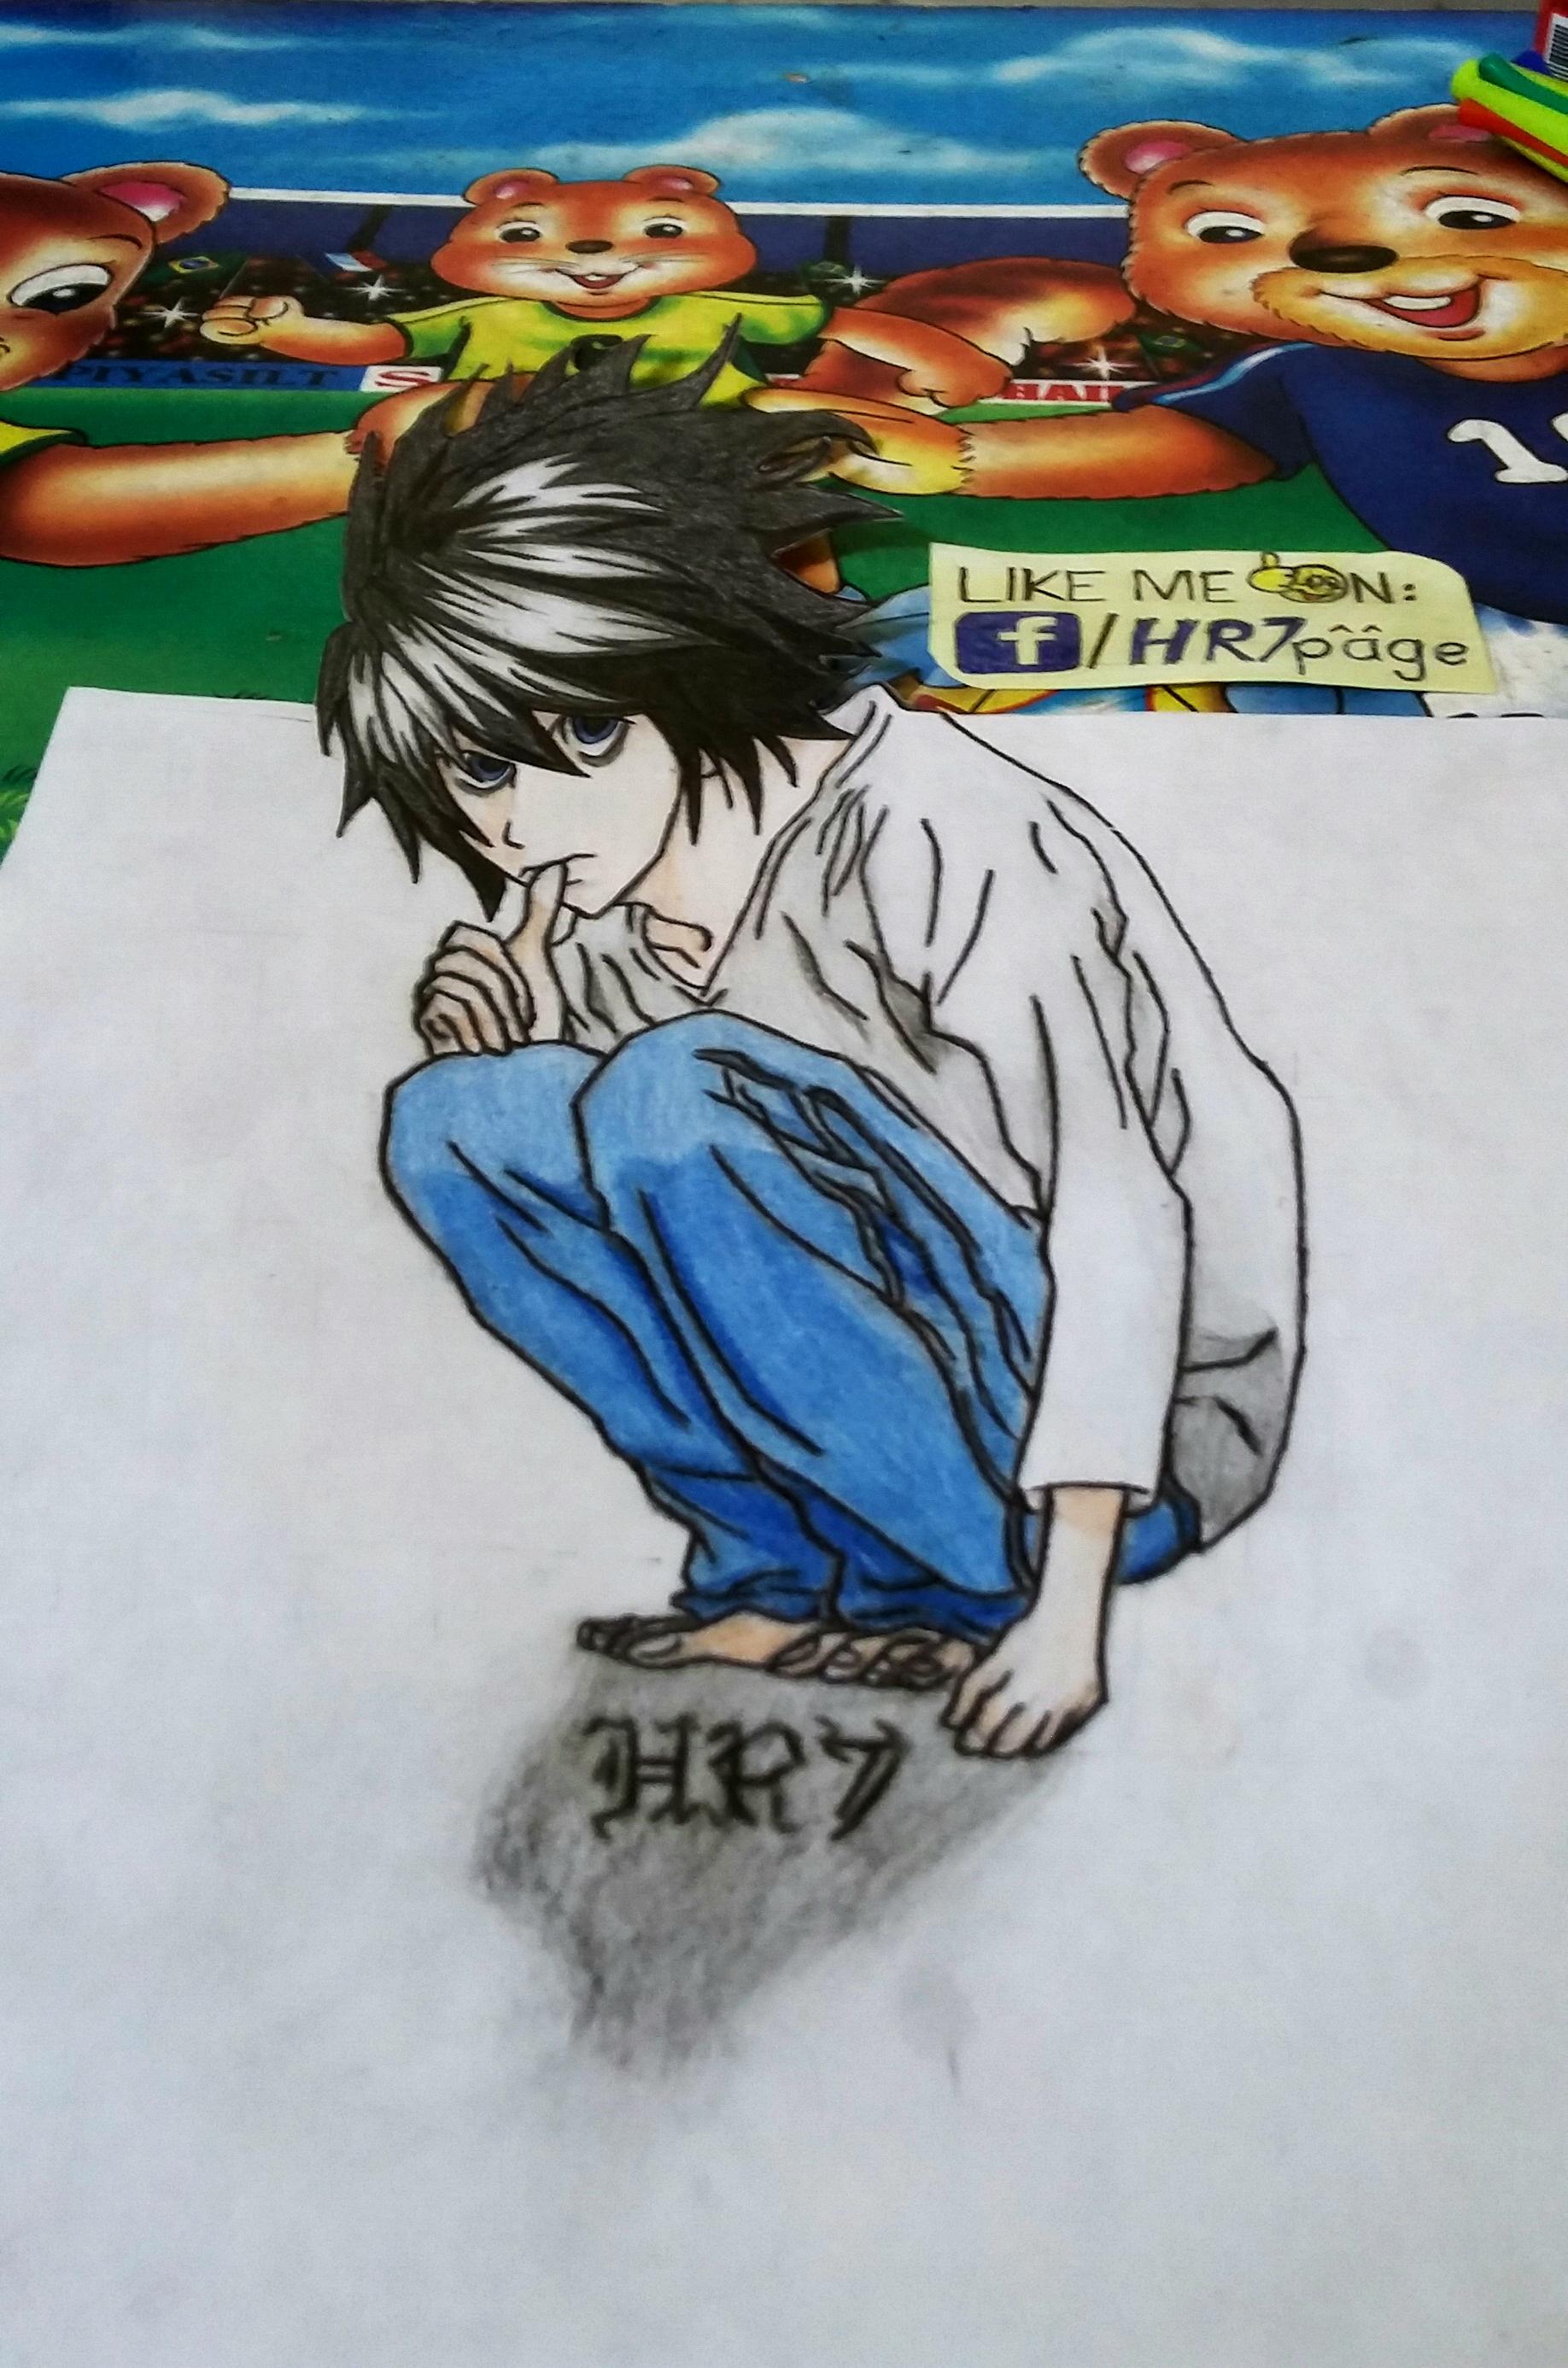 l lawliet 3d drawing by hr7xman on deviantart deviantart